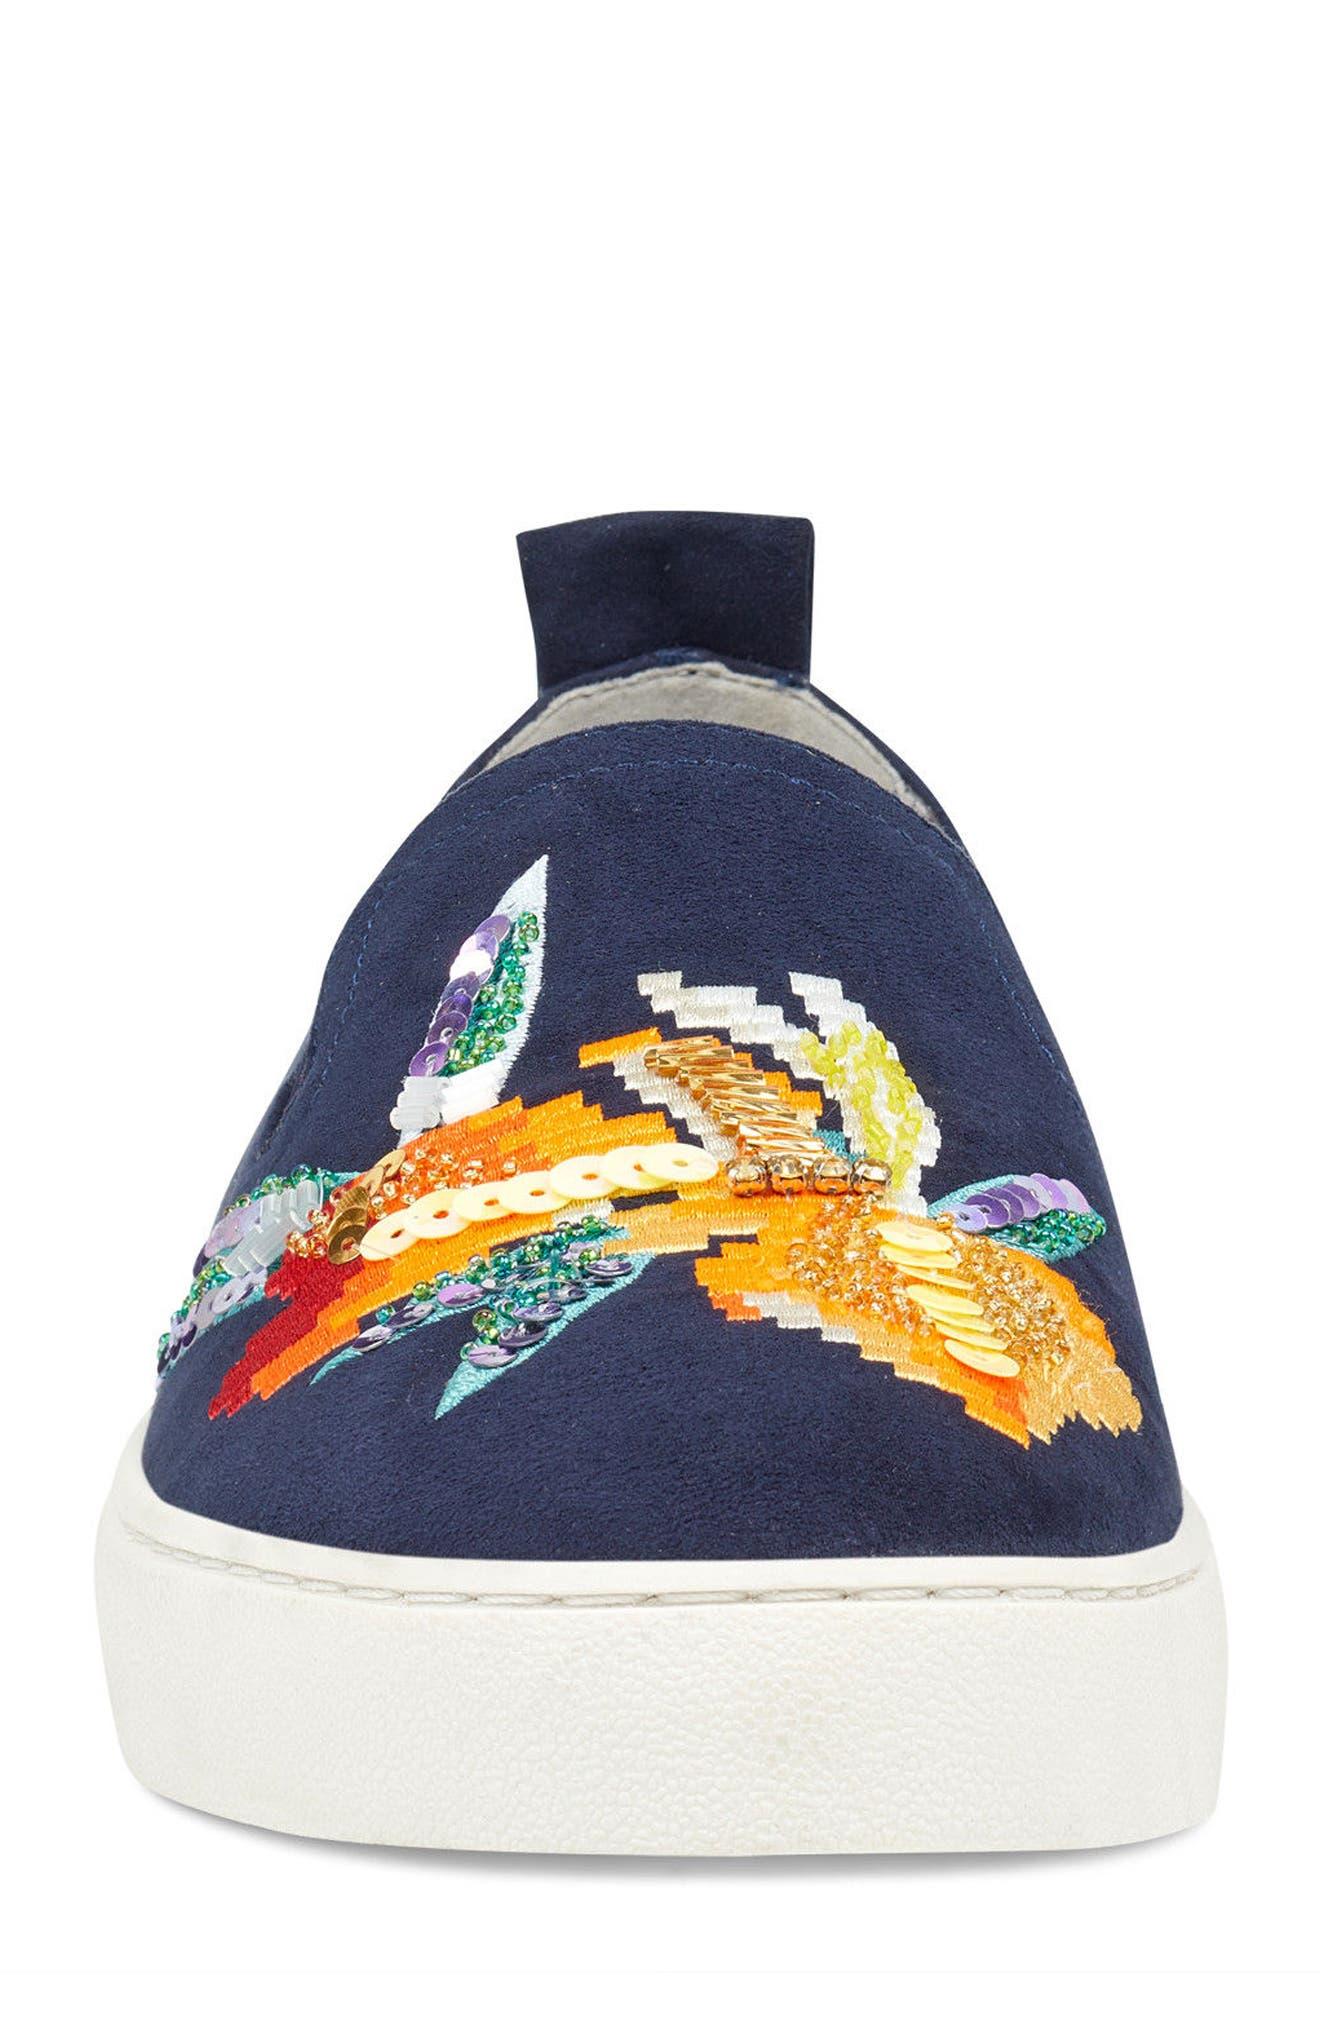 Playavista Slip-On Sneaker,                             Alternate thumbnail 4, color,                             Navy Suede